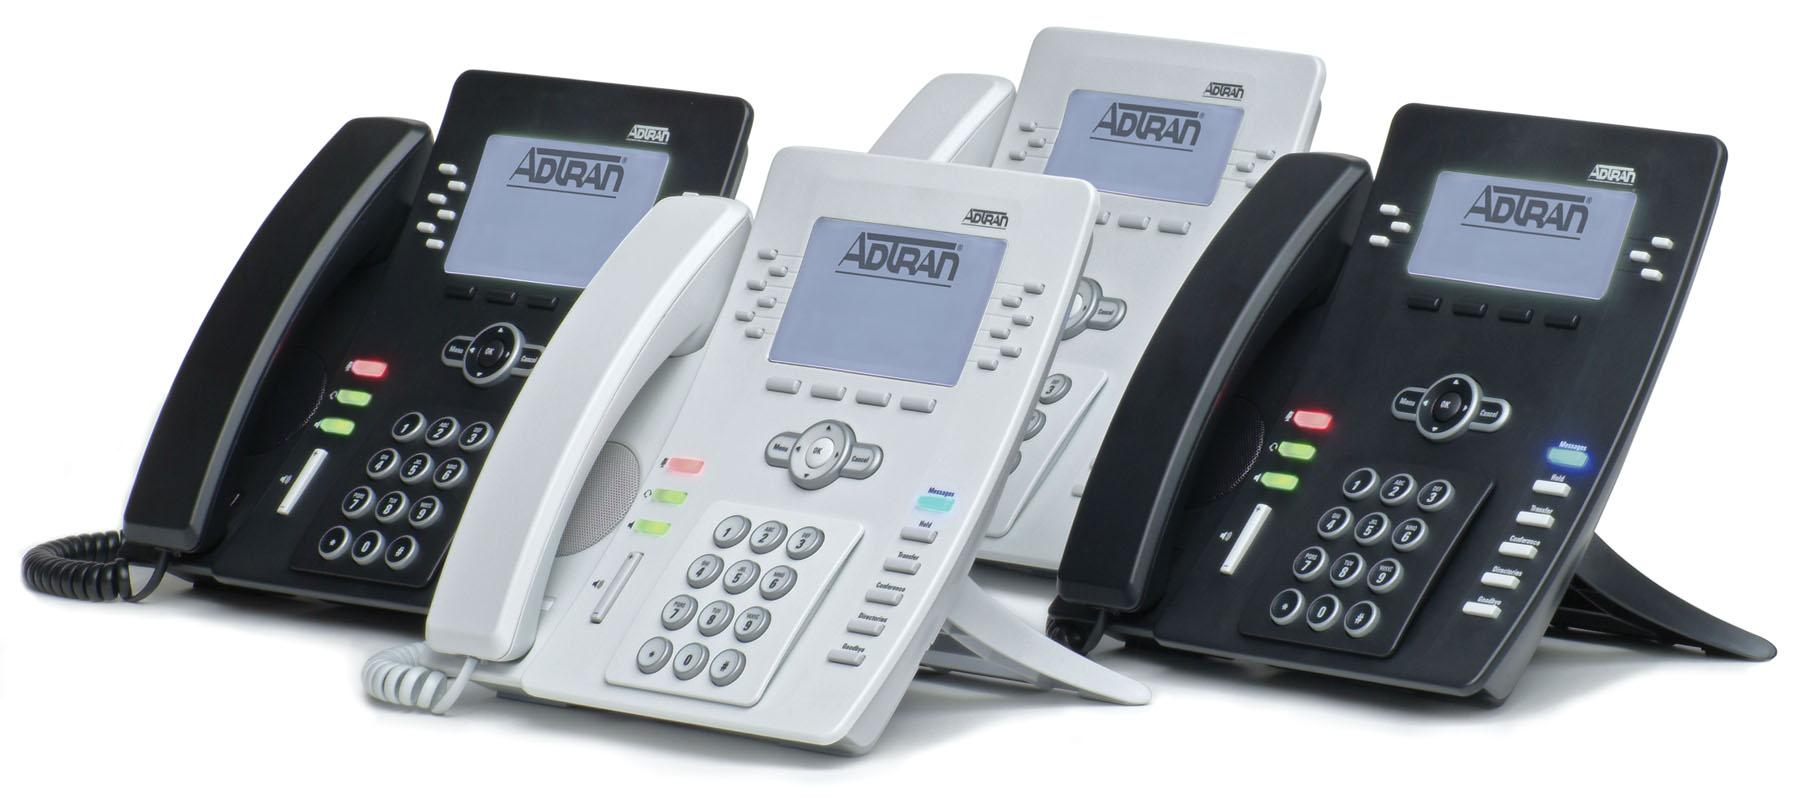 adtran phones